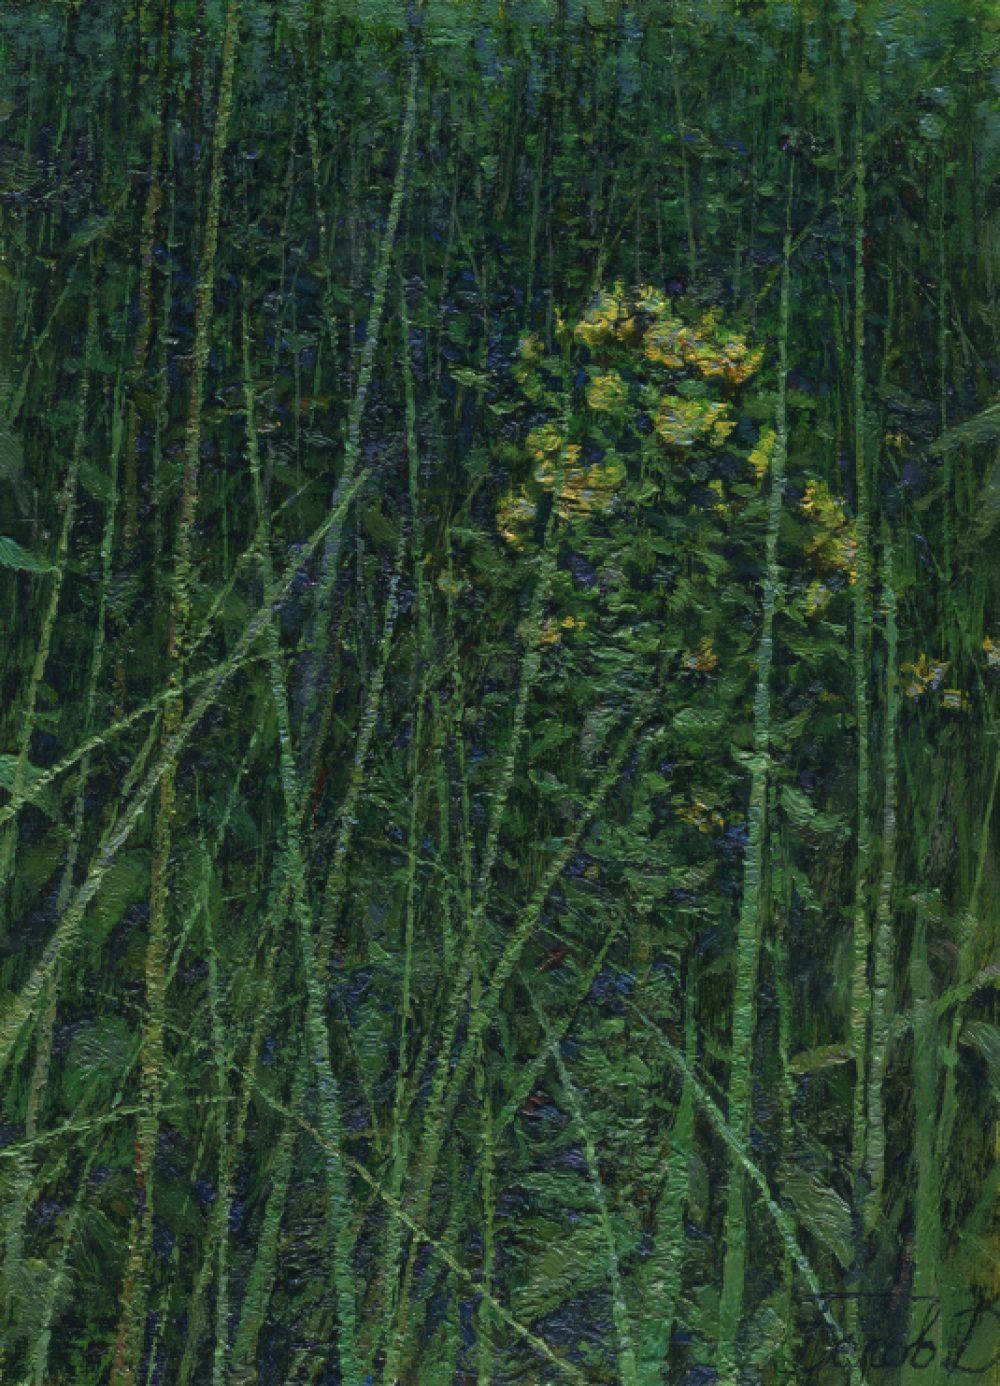 Evening grasses landscape oil painting by Daniil Belov